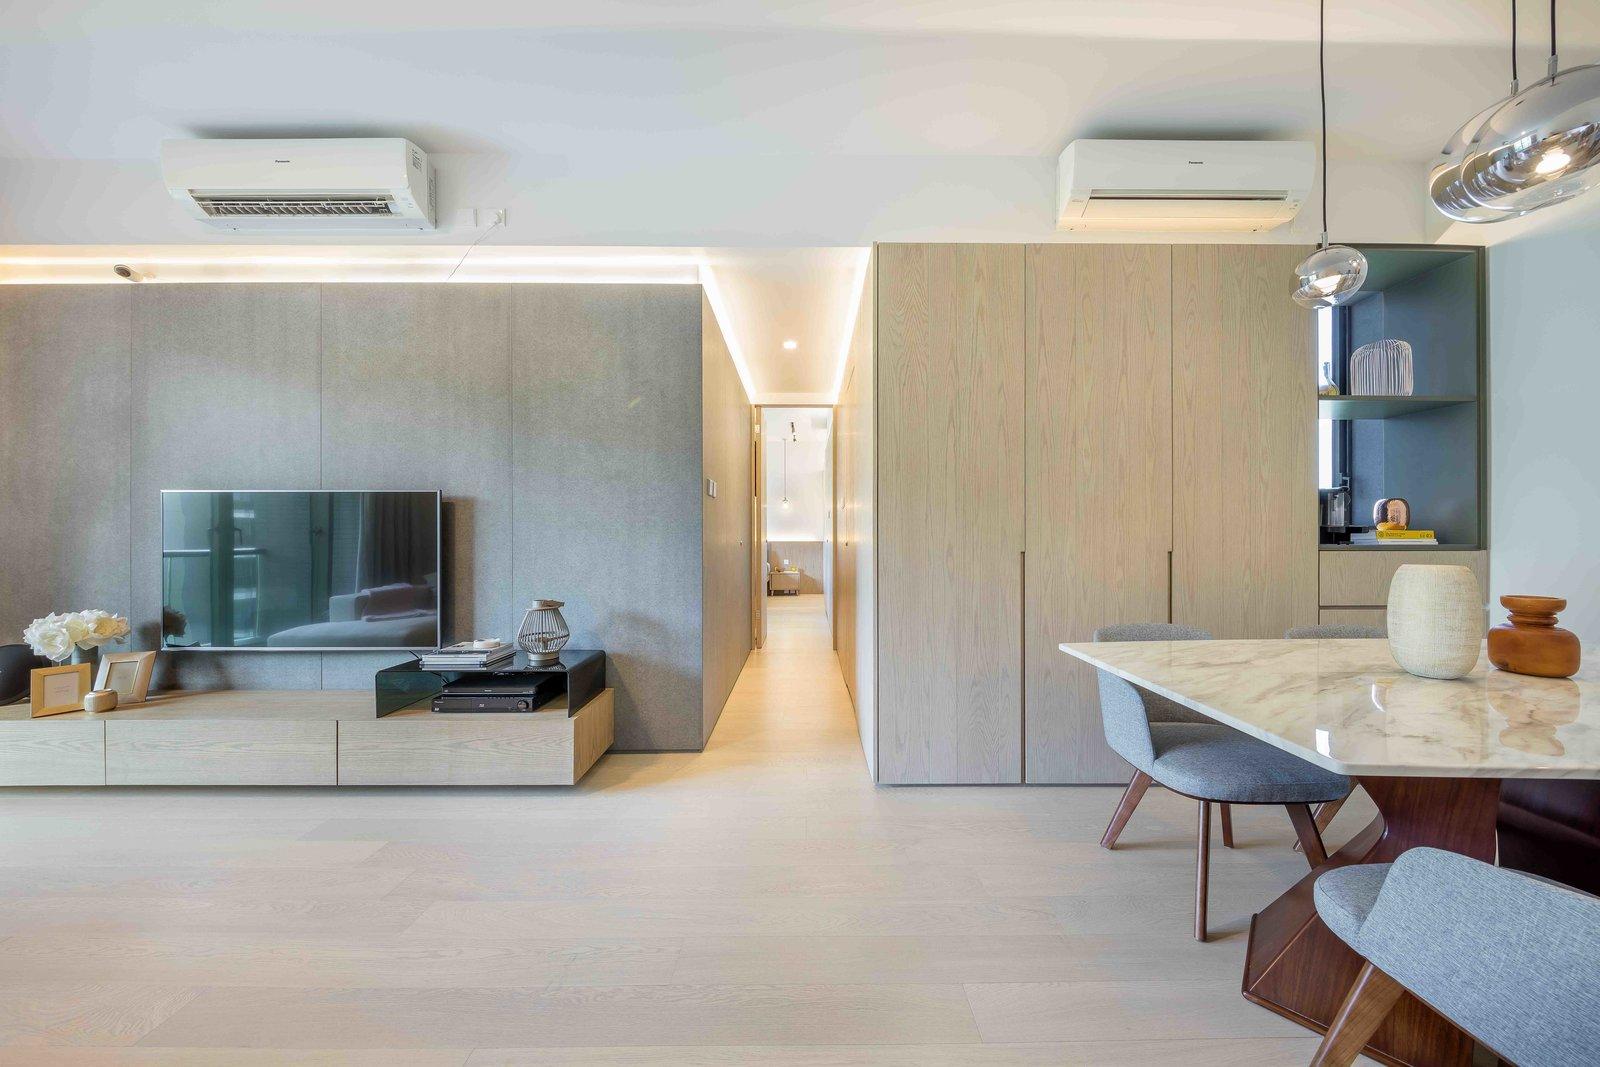 Dragon S Range Studio Adjective Hong Kong Modern Home In 香港香港 By On Dwell